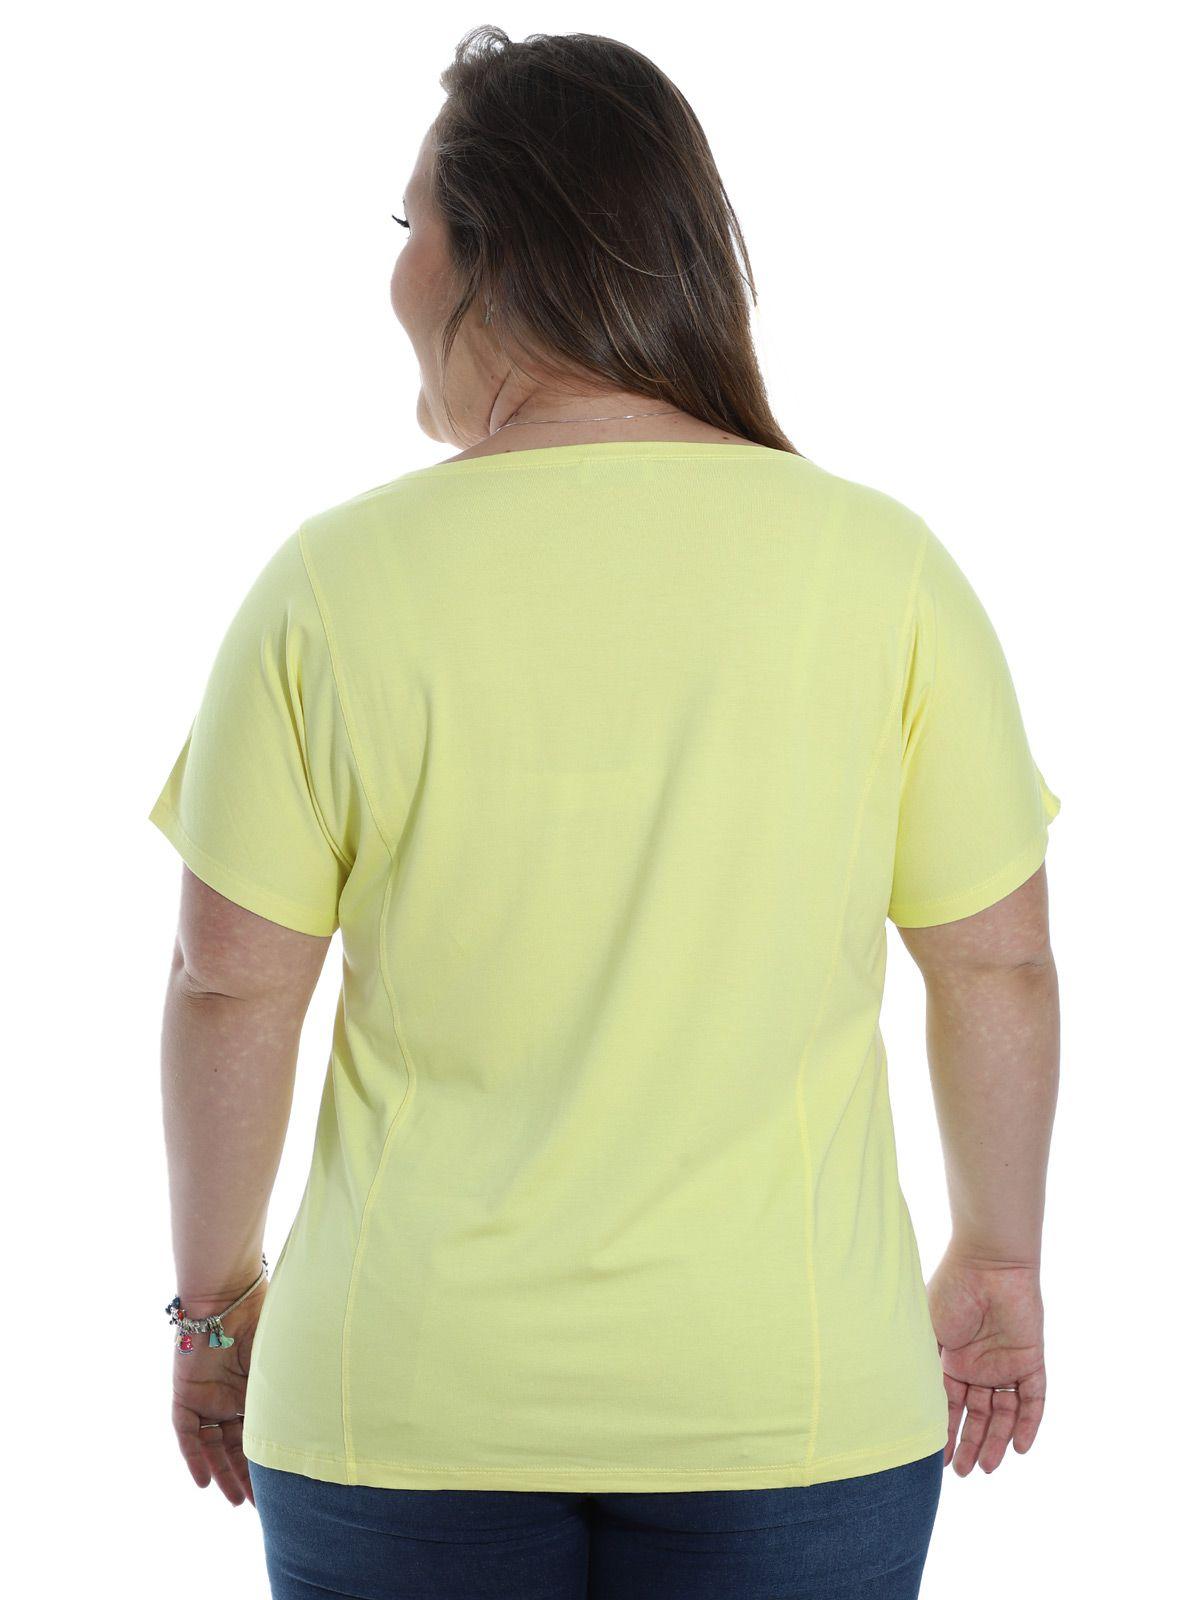 Blusa Plus Size KTS Frente com Estampa Color Amarelo